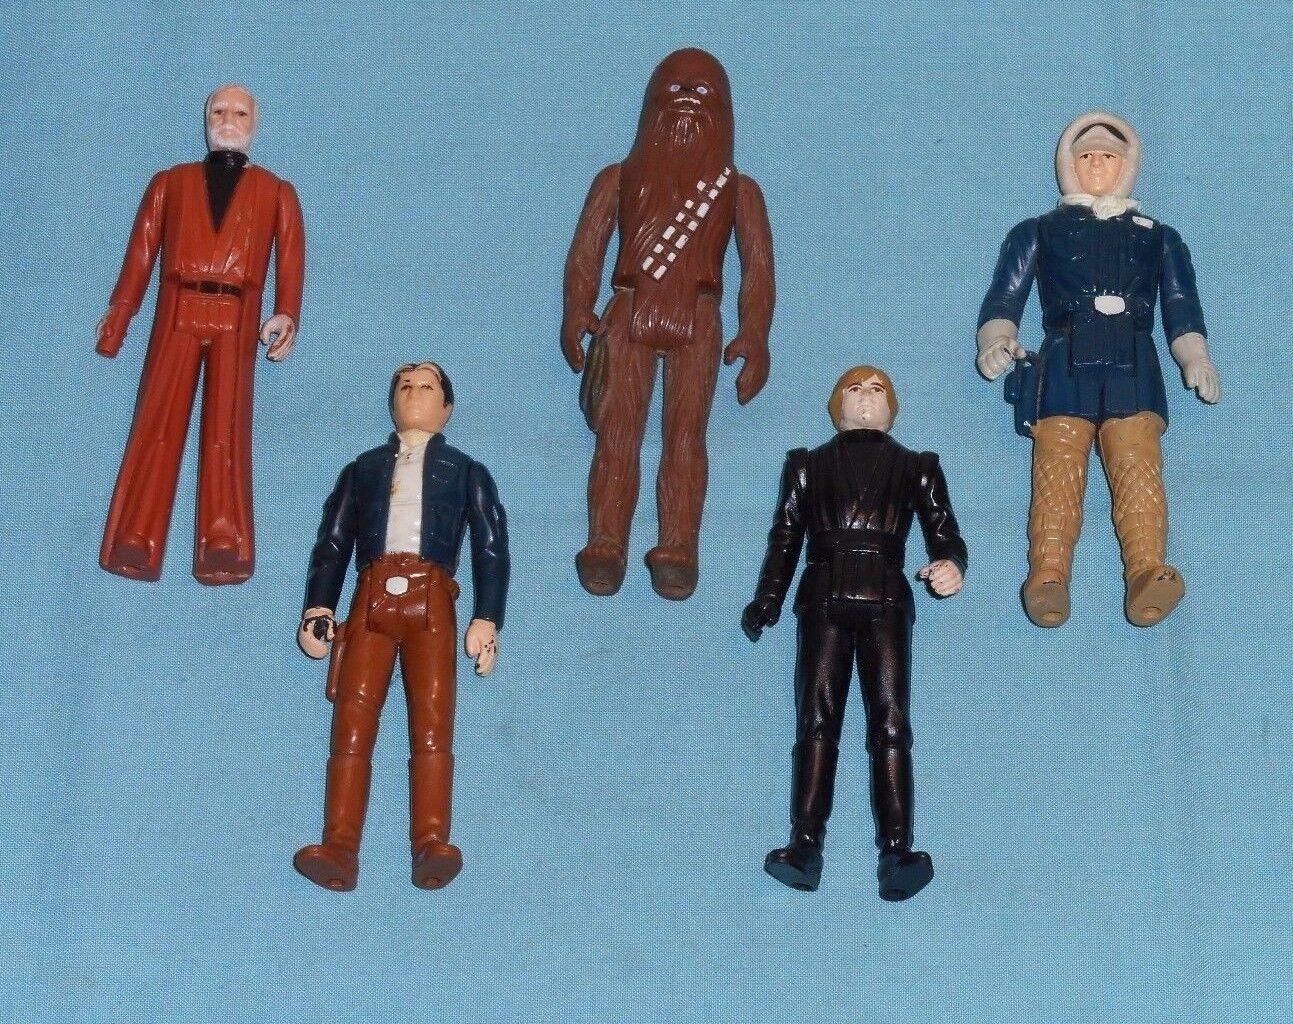 Vintage STAR WARS FIGURE LOT Chewbacca Ben Kenobi Han Hoth Bespin Luke Jedi